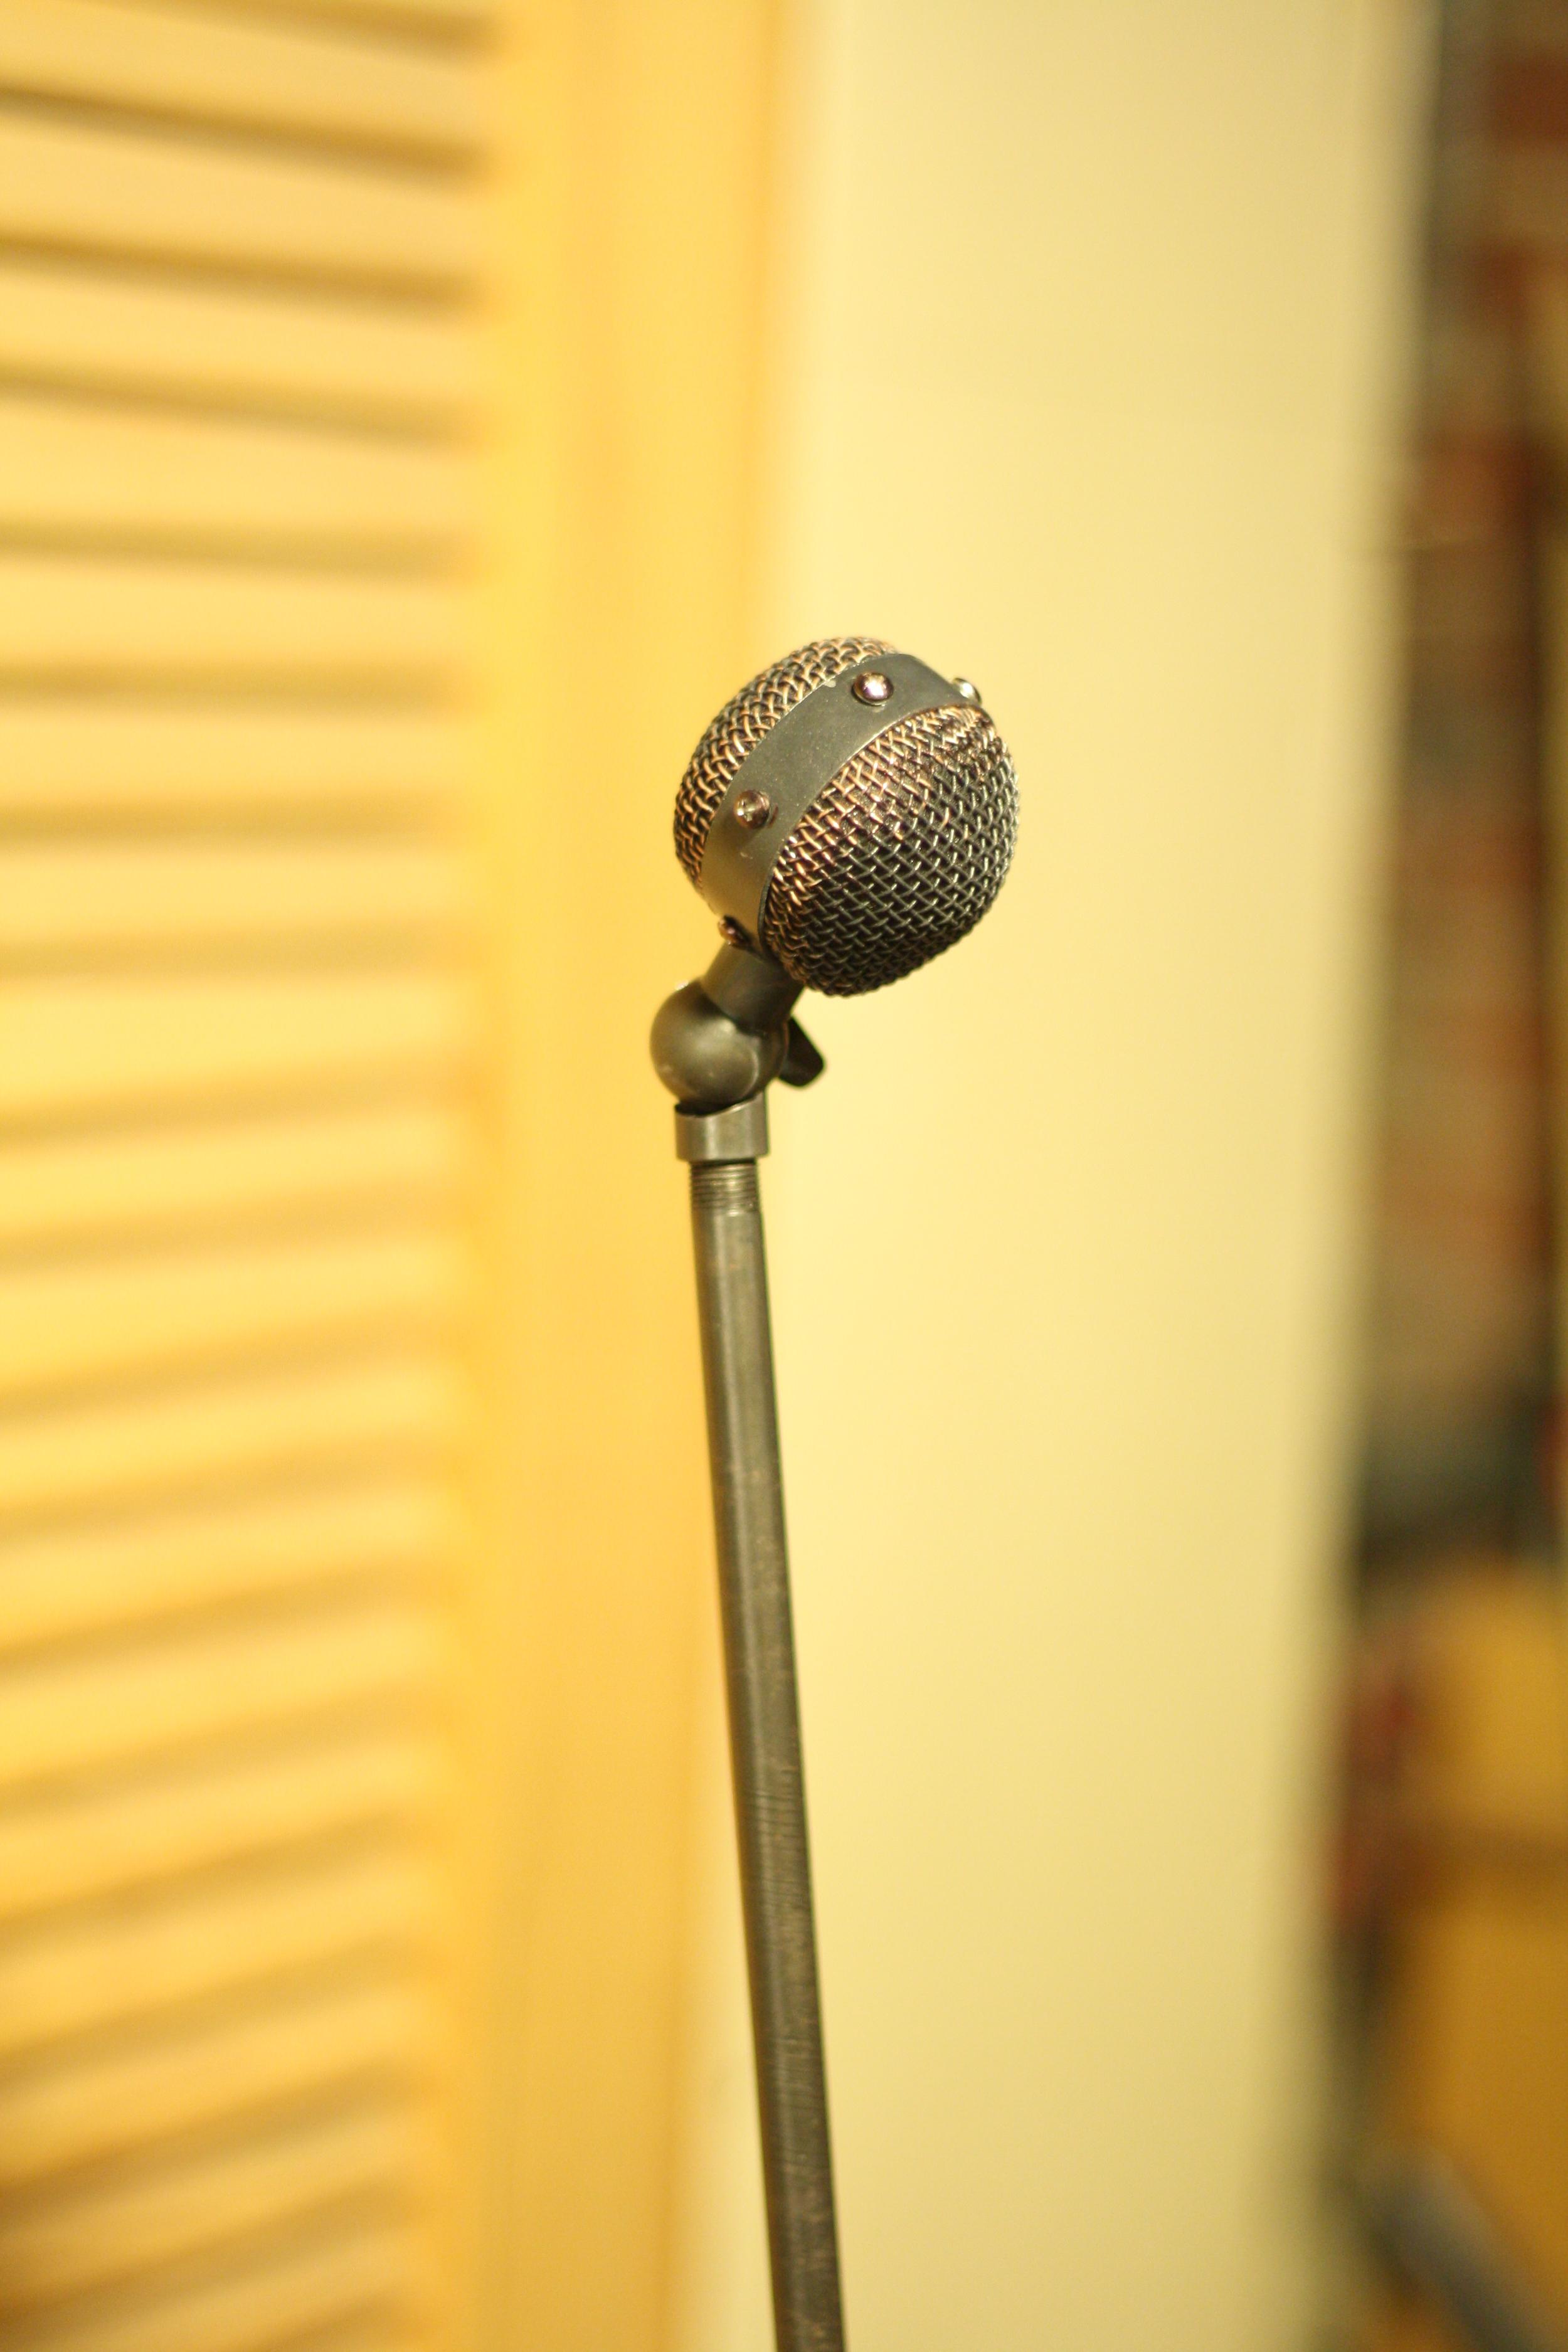 A long-necked black mic in the style of Bob Barker's  Sony ECM-510